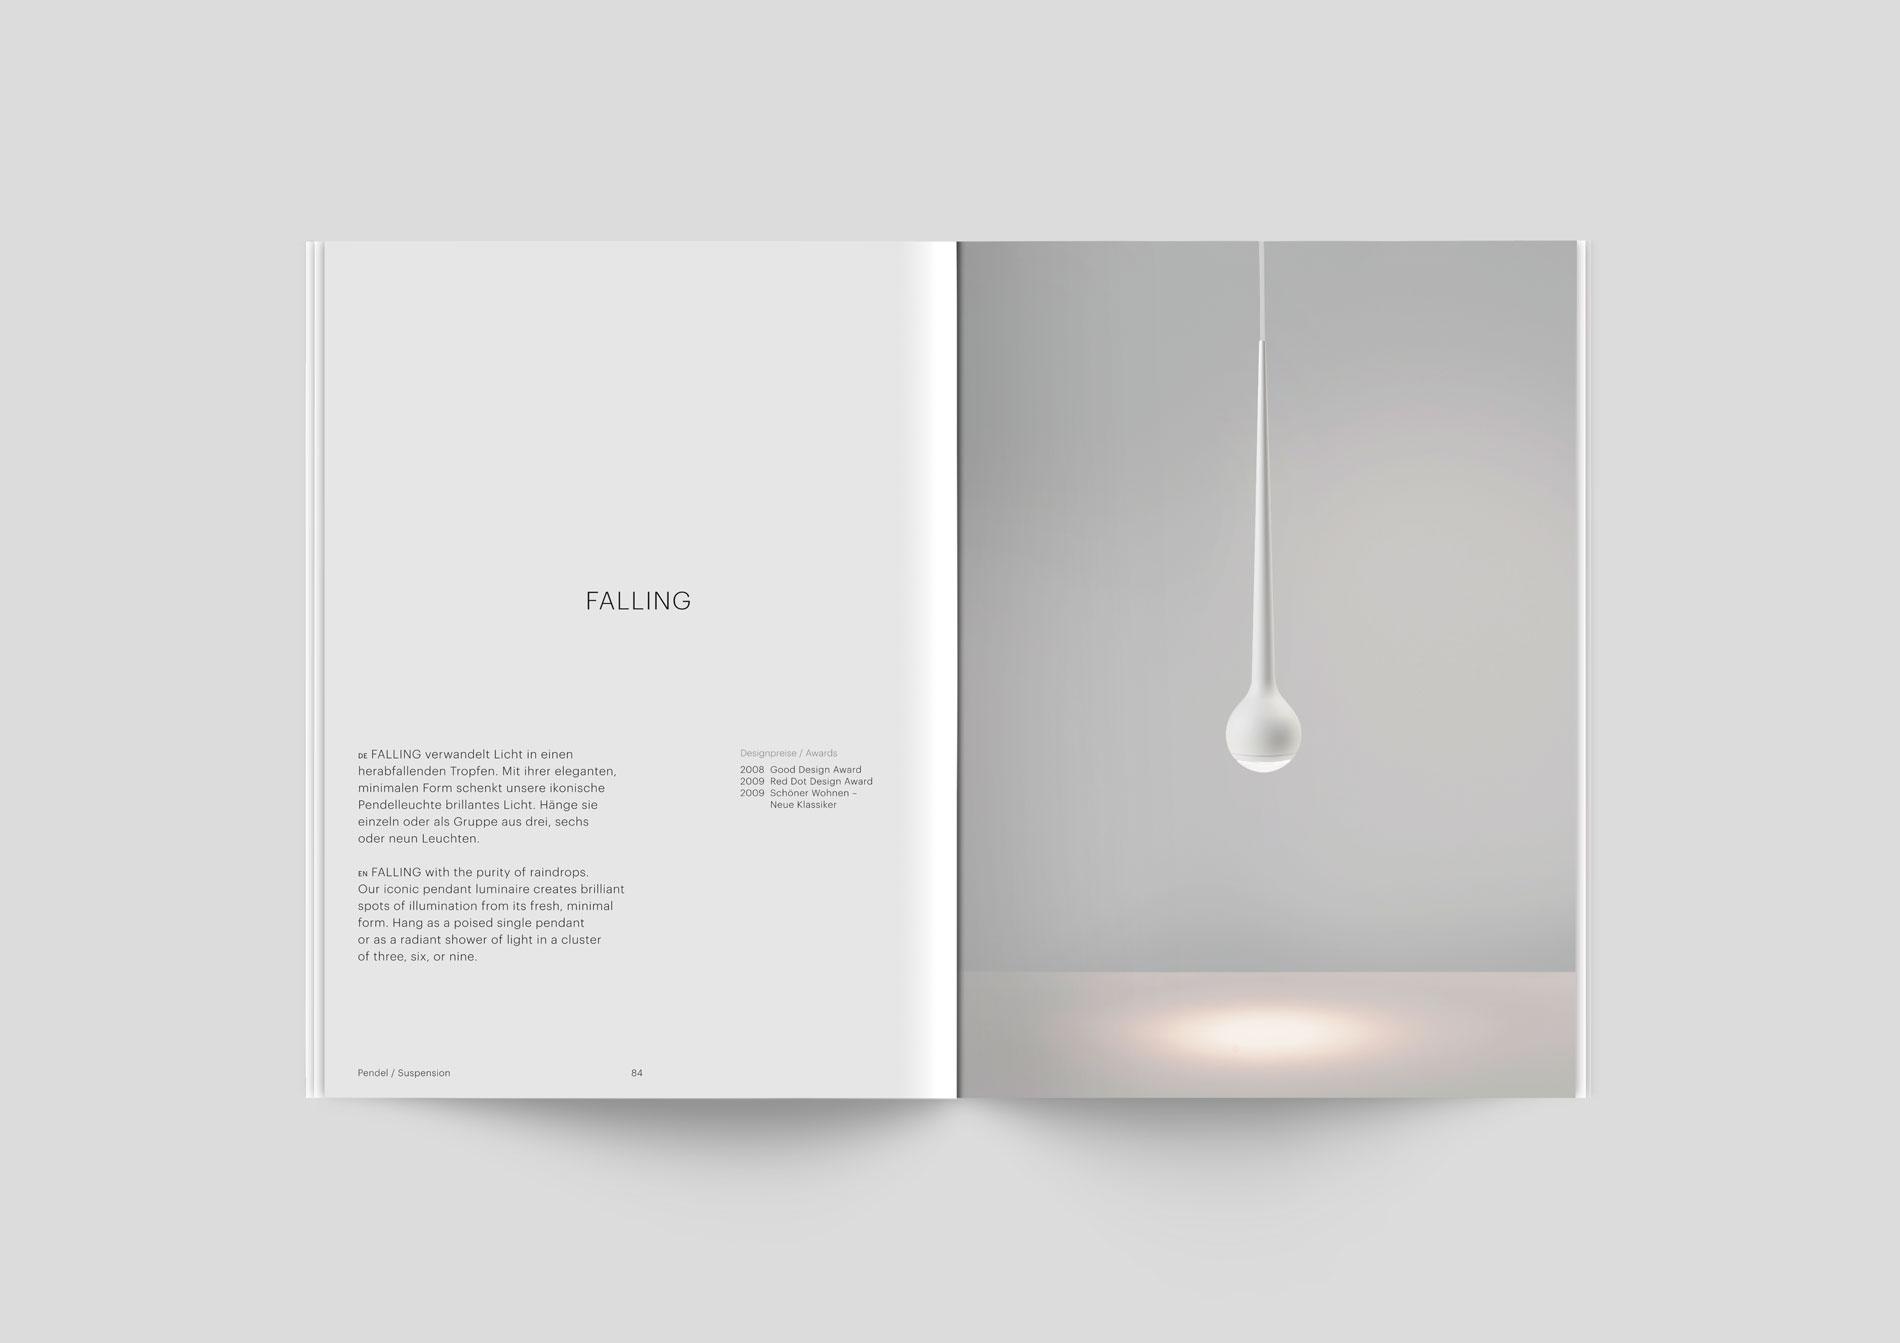 nicoletta-dalfino-tobias-grau-catalogue-2019-falling